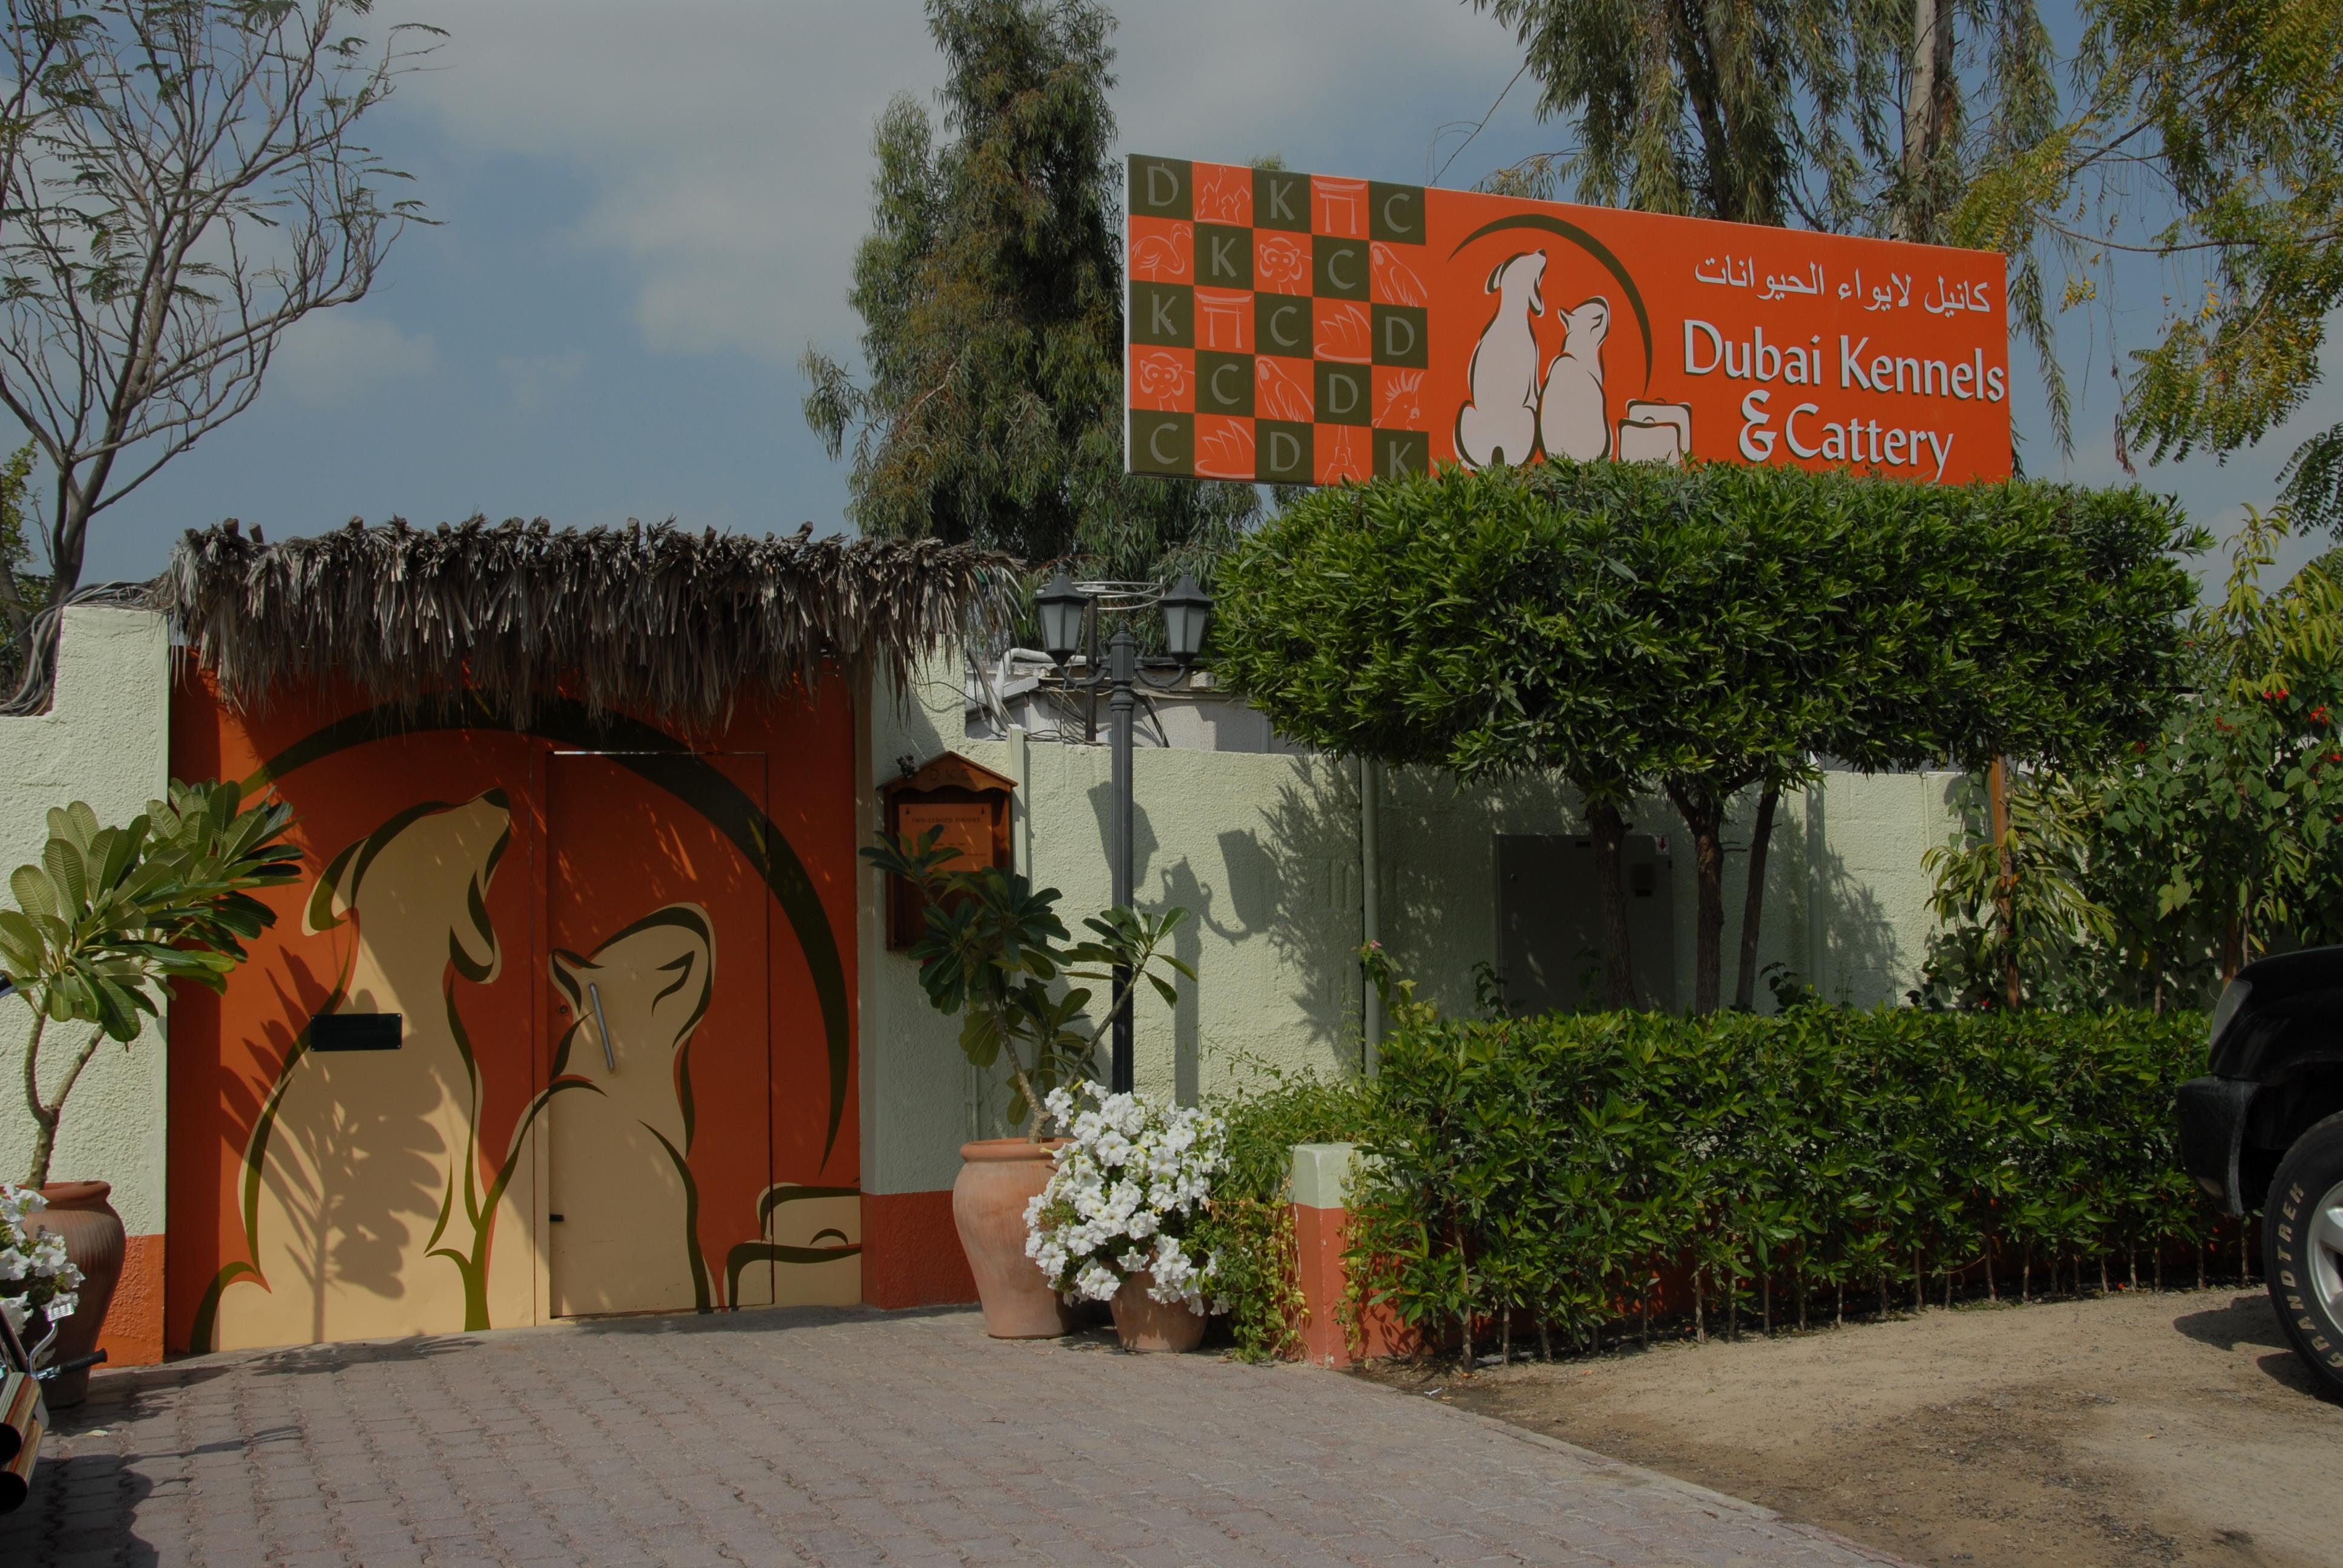 Pet Friendly Dubai Kennels & Cattery (DKC)